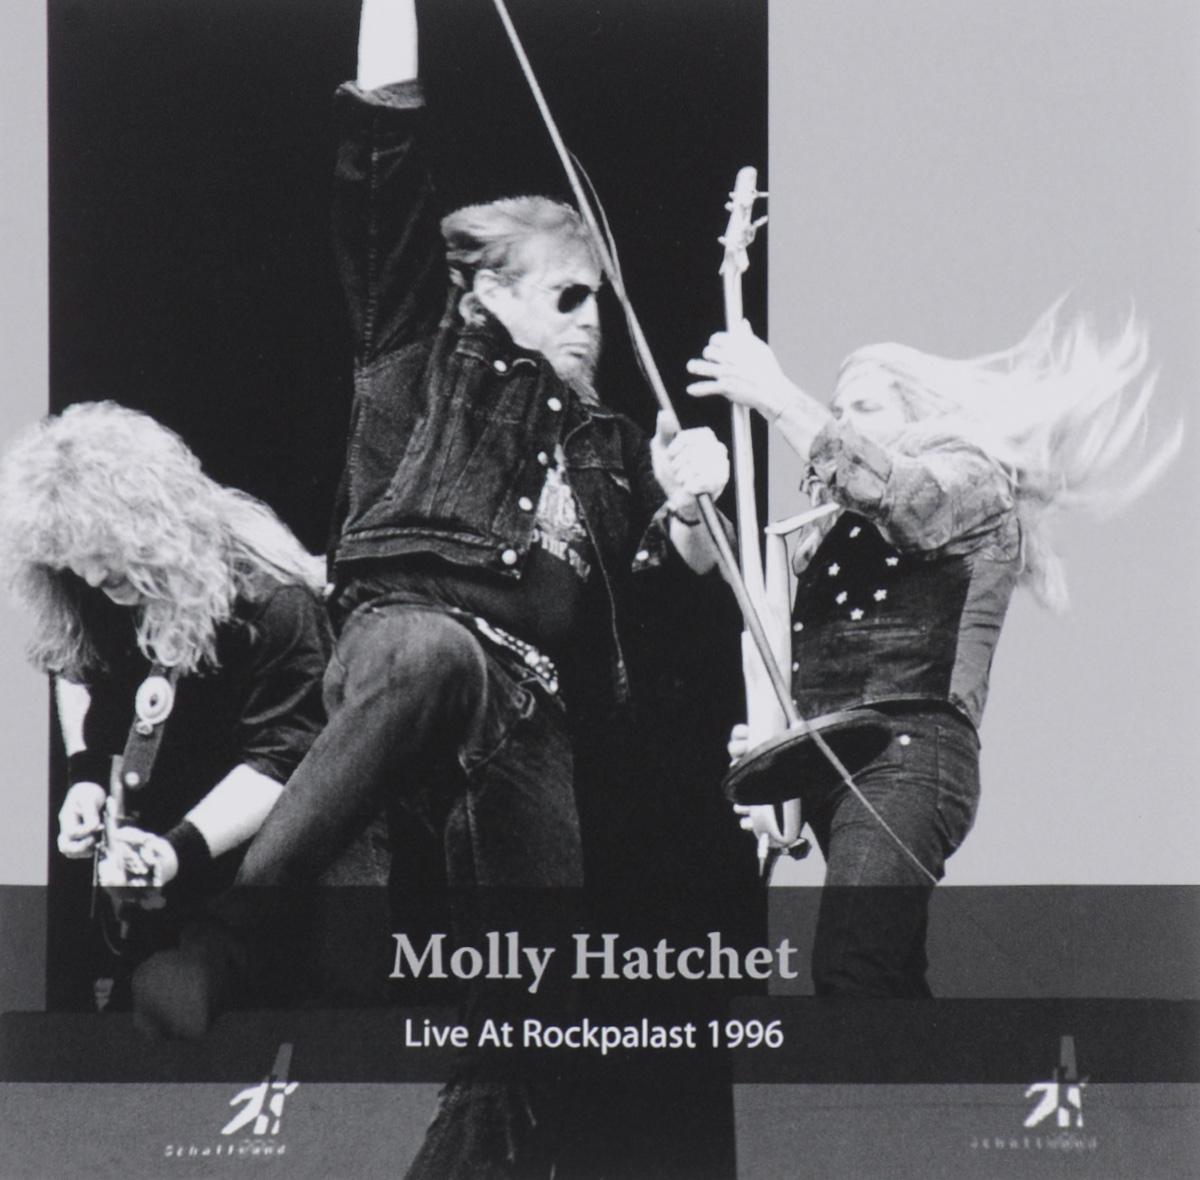 Молли Хатчет Molly Hatchet. Live At Rockpalast 1996 10pcs 24v dc coil power relay dpdt ly2nj hh62p l jqx 13f